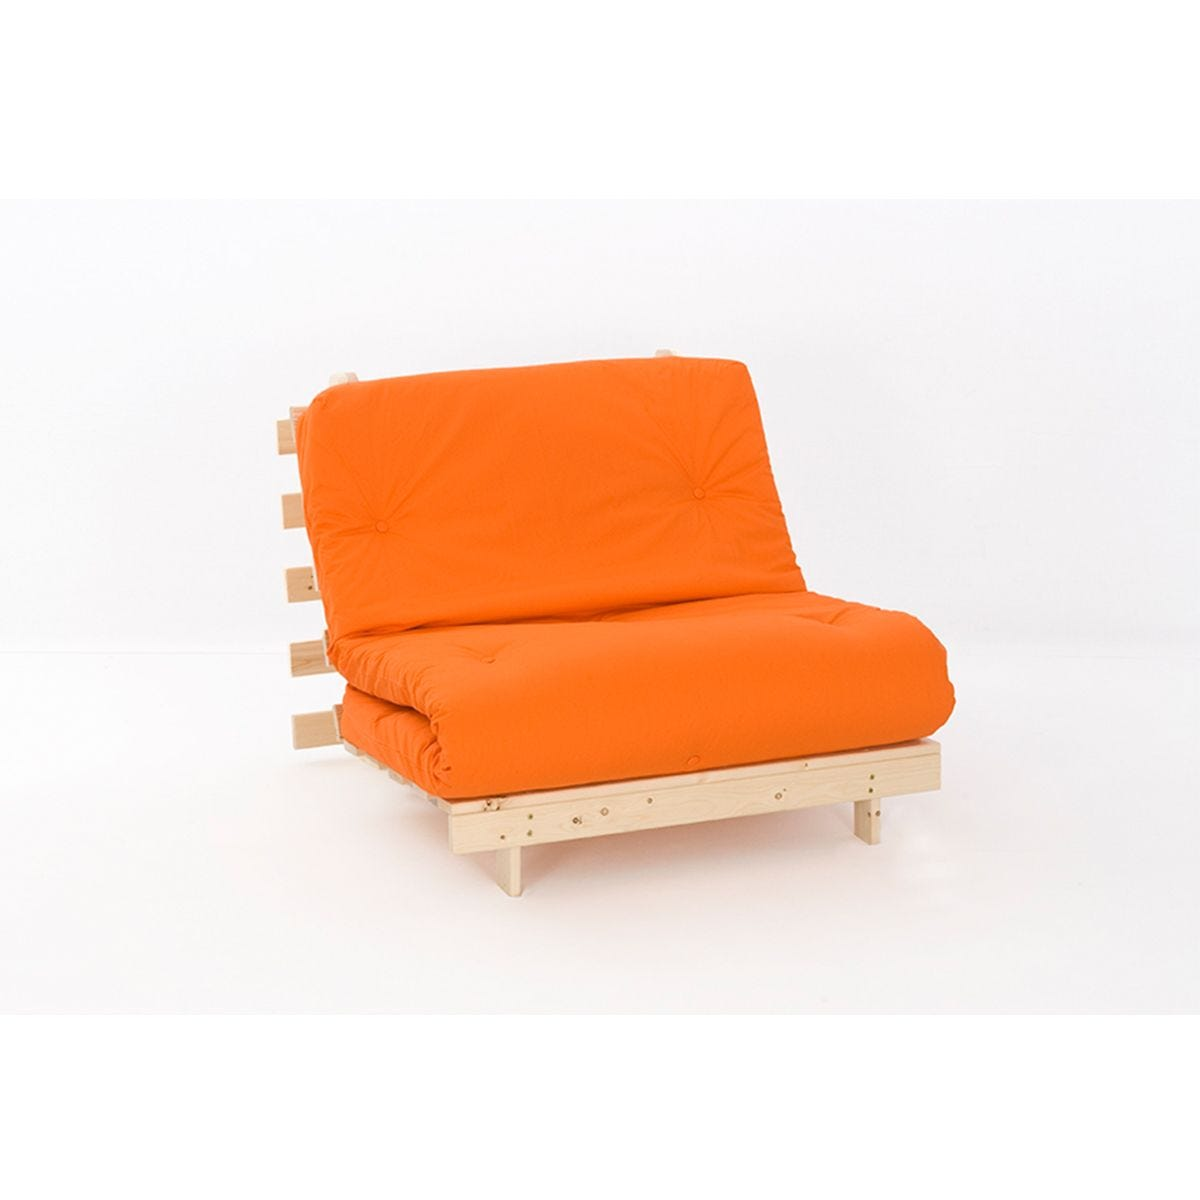 Ayr Futon Single Set With Tufted Mattress - Orange